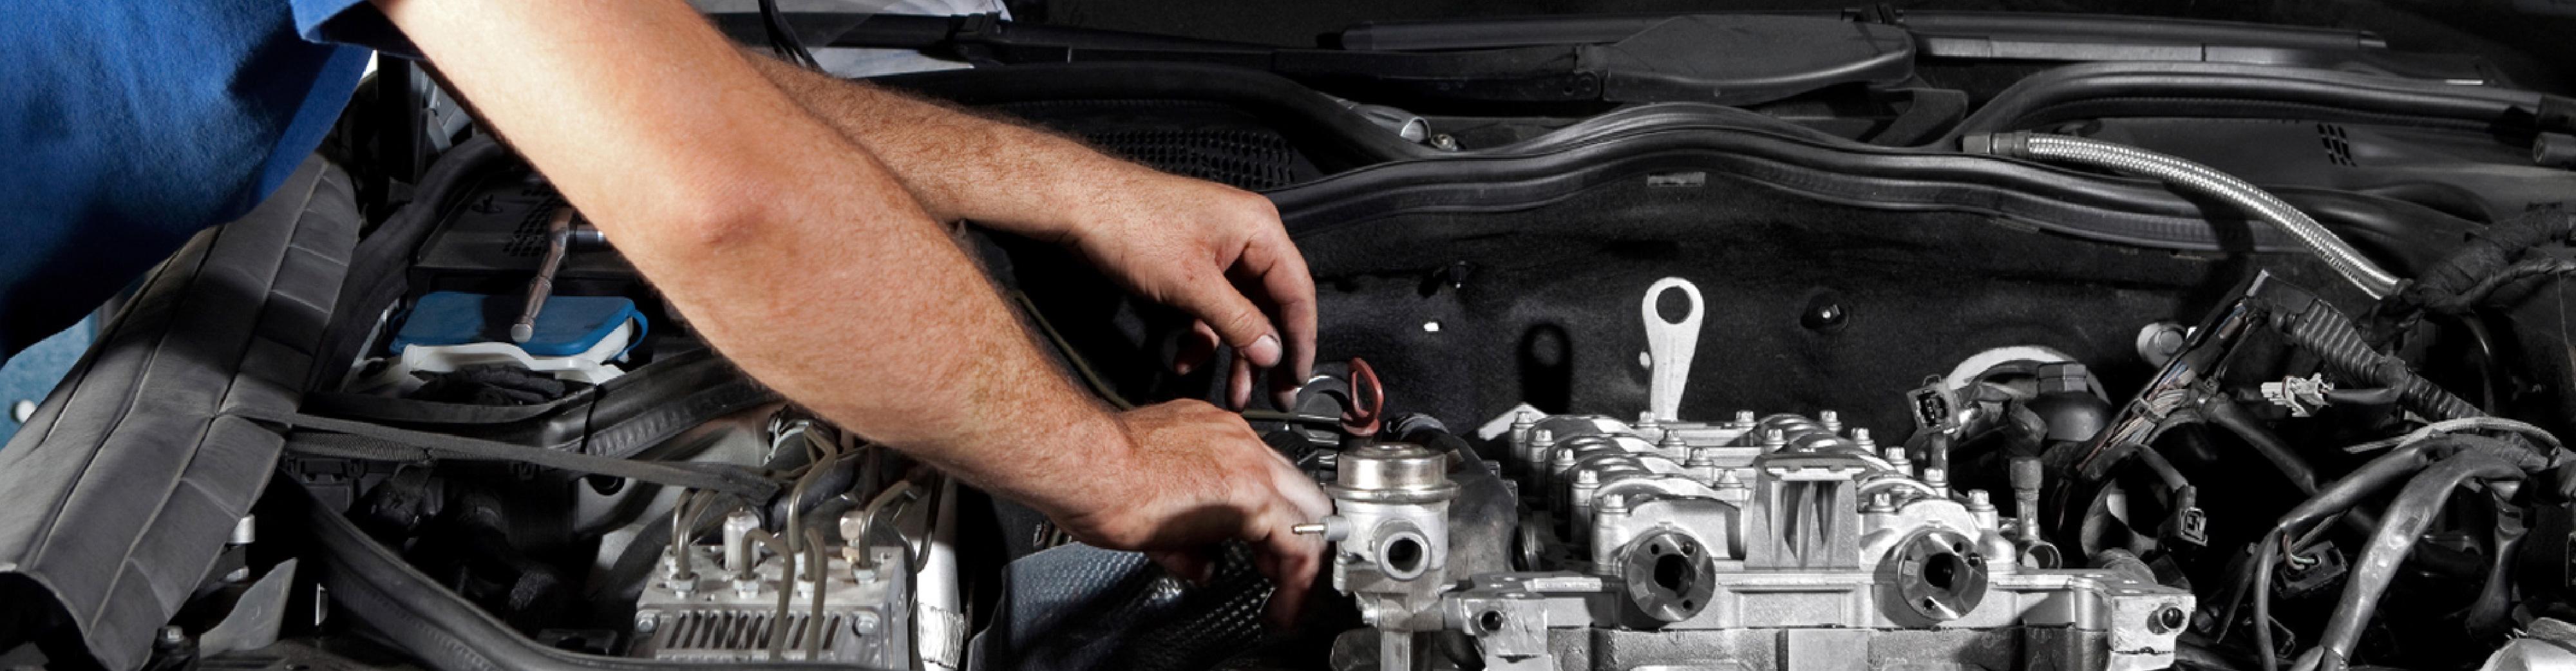 Belts, Hoses and Filters | Car Kings Inc | Wallington, NJ